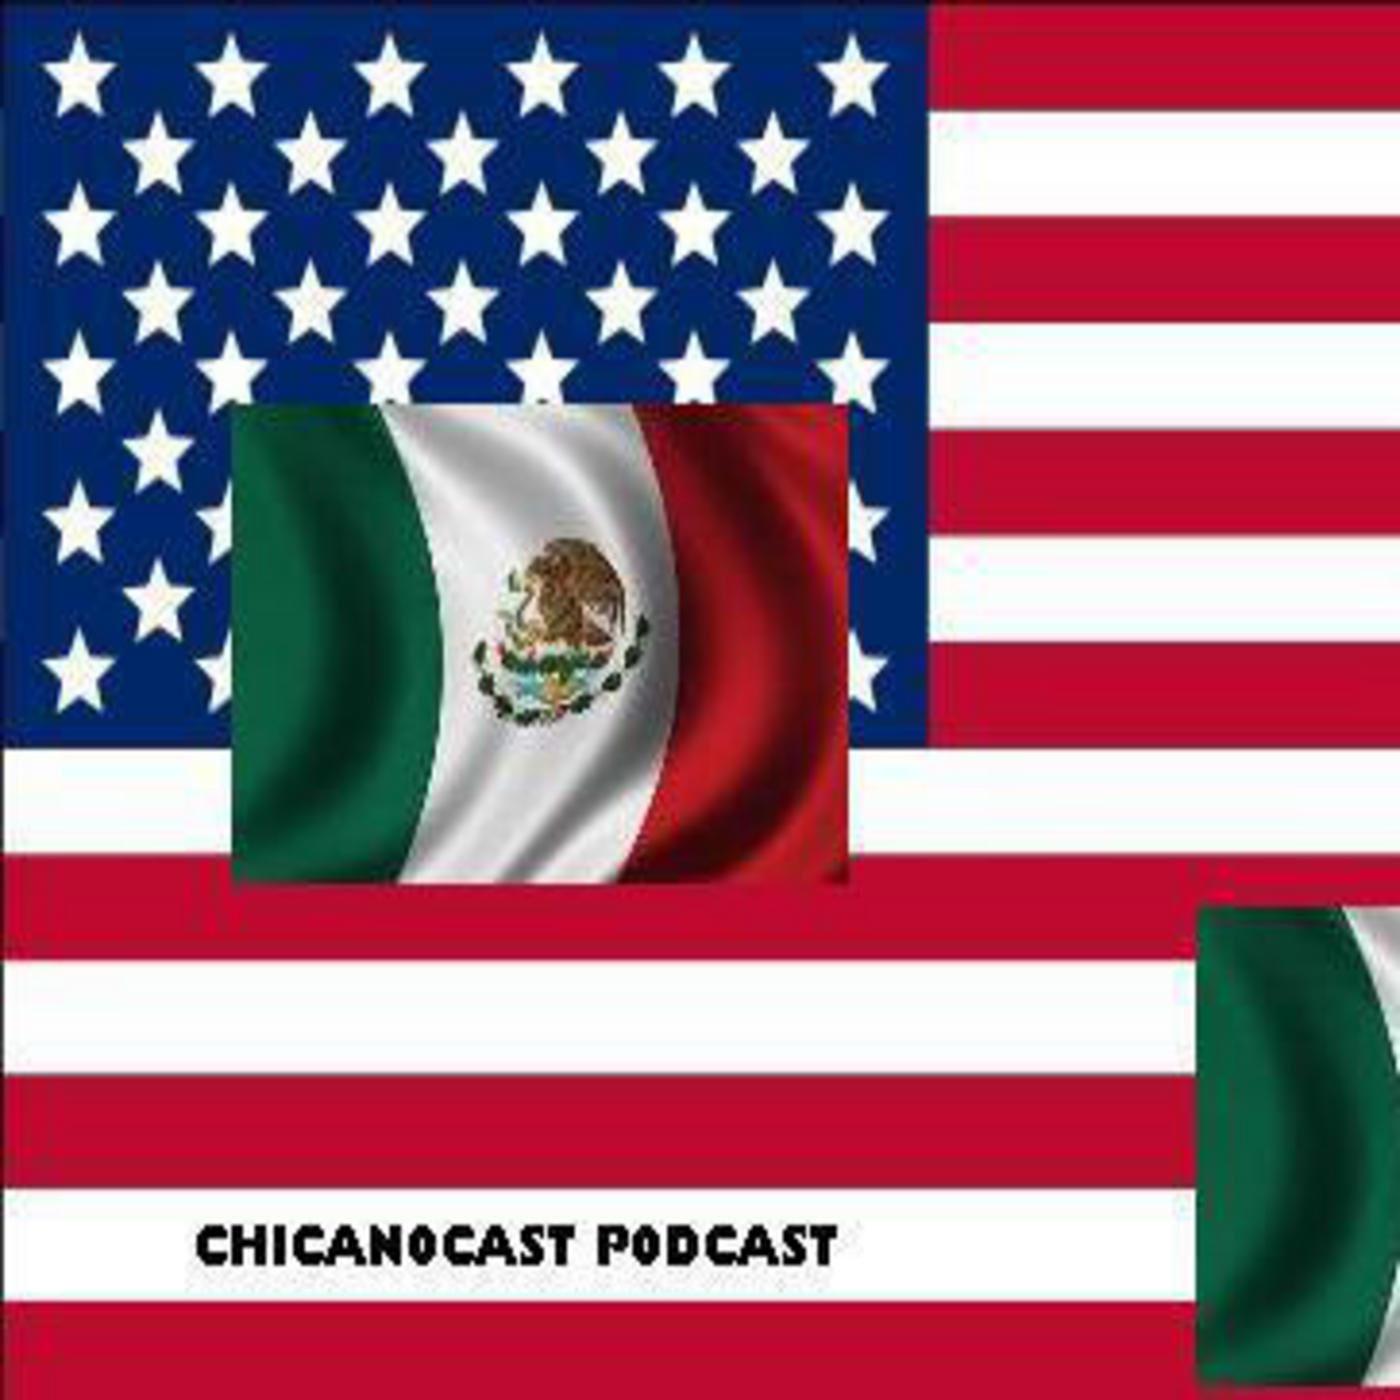 ChicanoCast #66 - Chicano Heritage Month - A Huevo! en ...